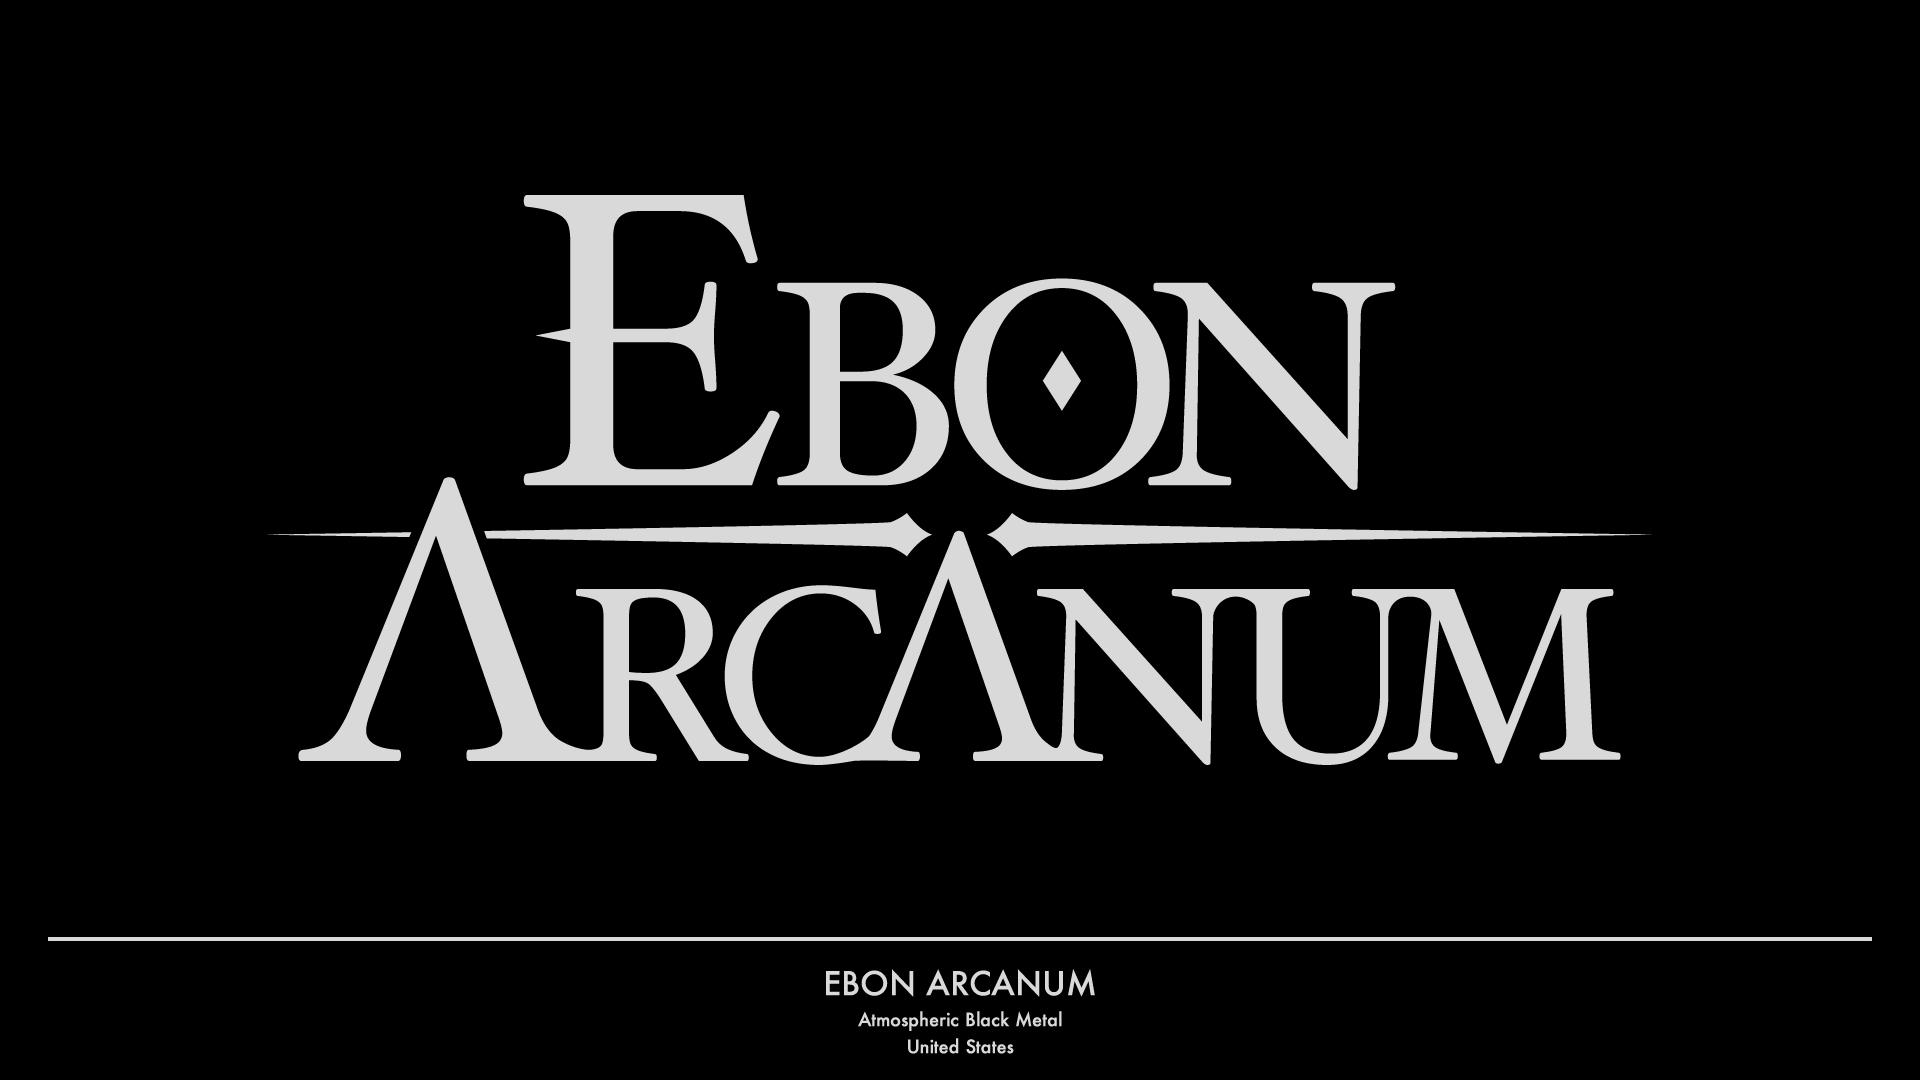 Ebon_Arcanum.jpg